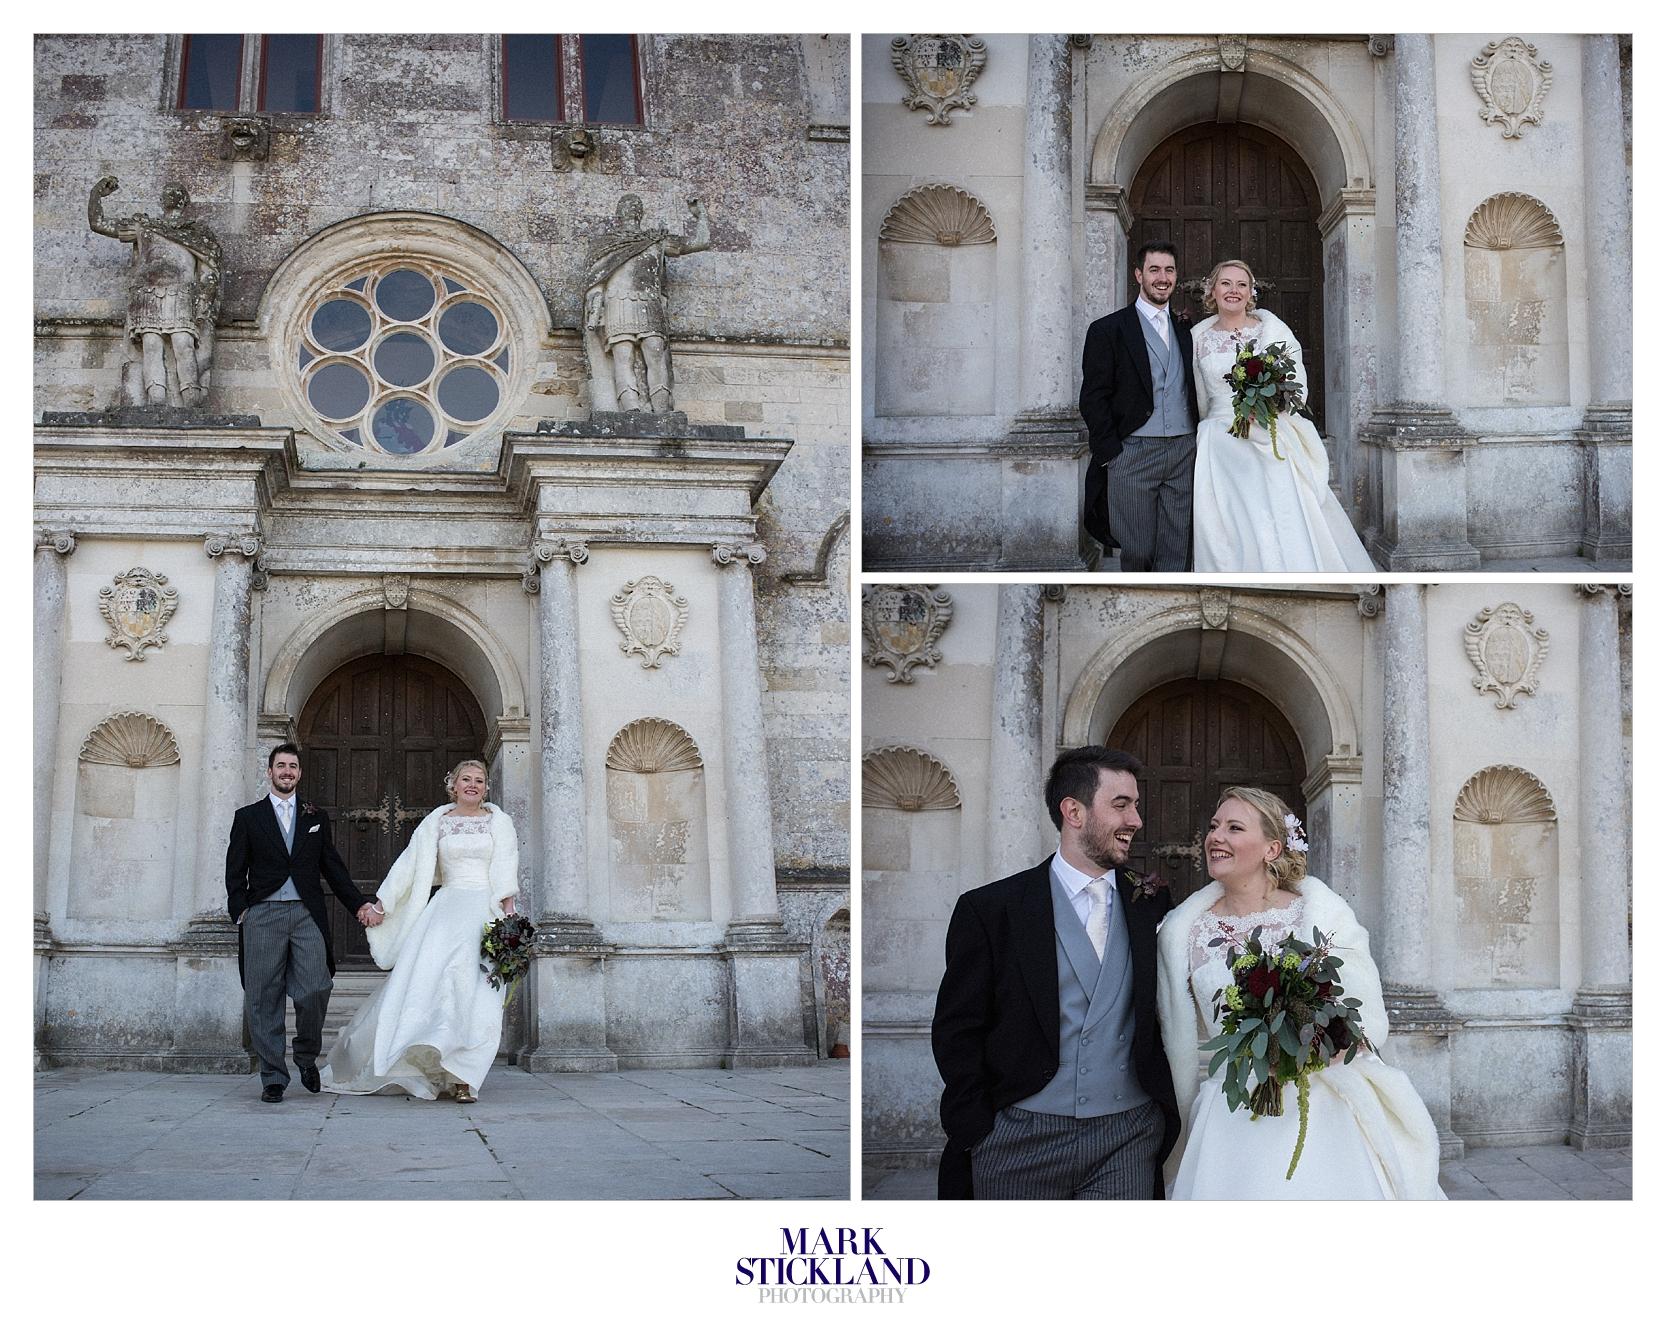 lulworth_castle_wedding_dorset_mark stickland photography.15